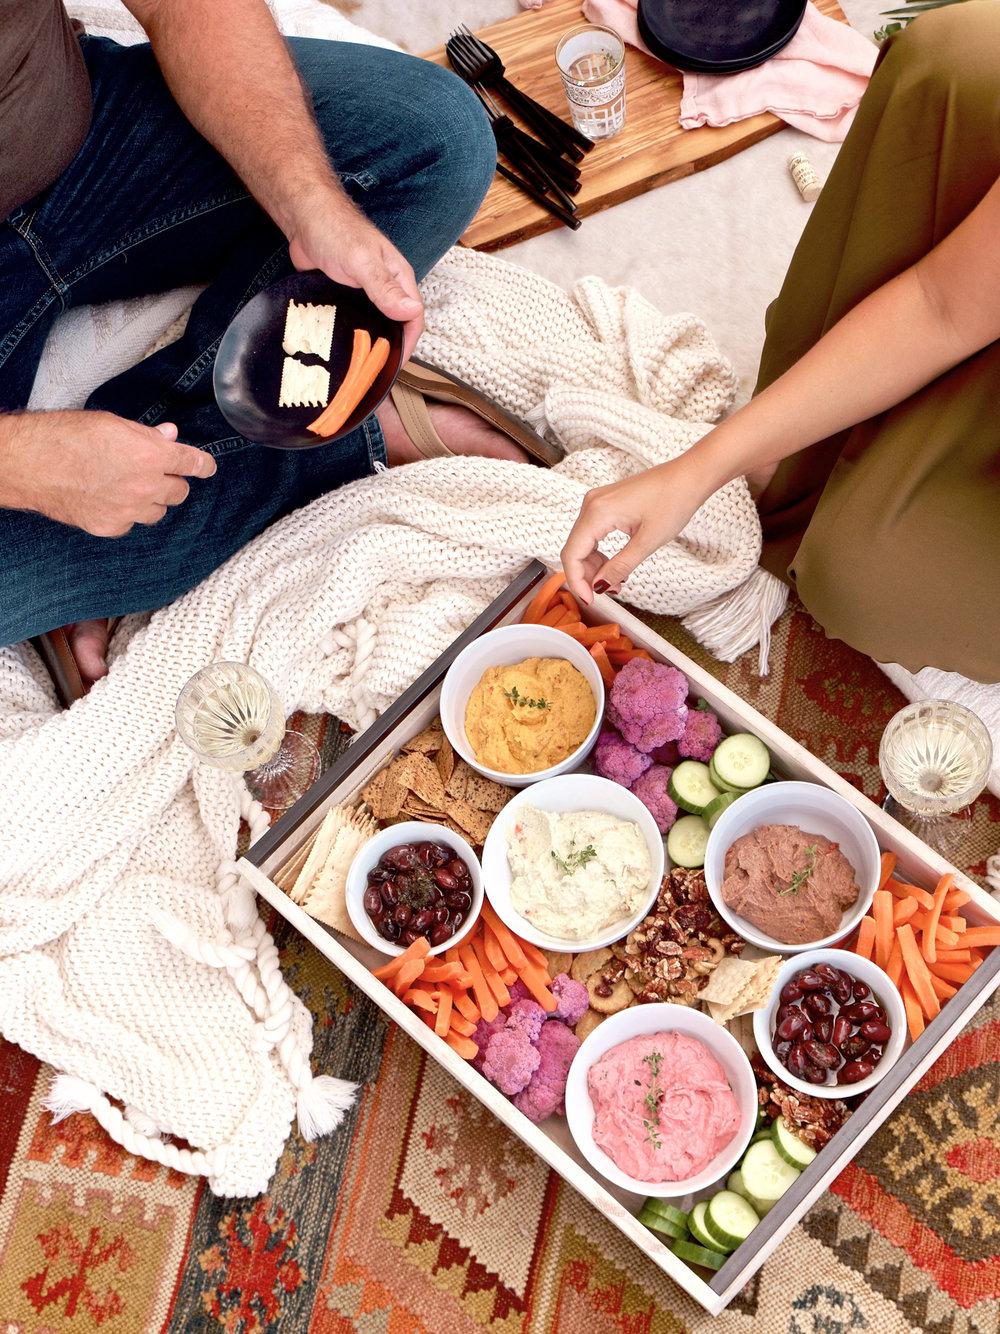 Healthy Hummus Snack Platter | A Fabulous Fete